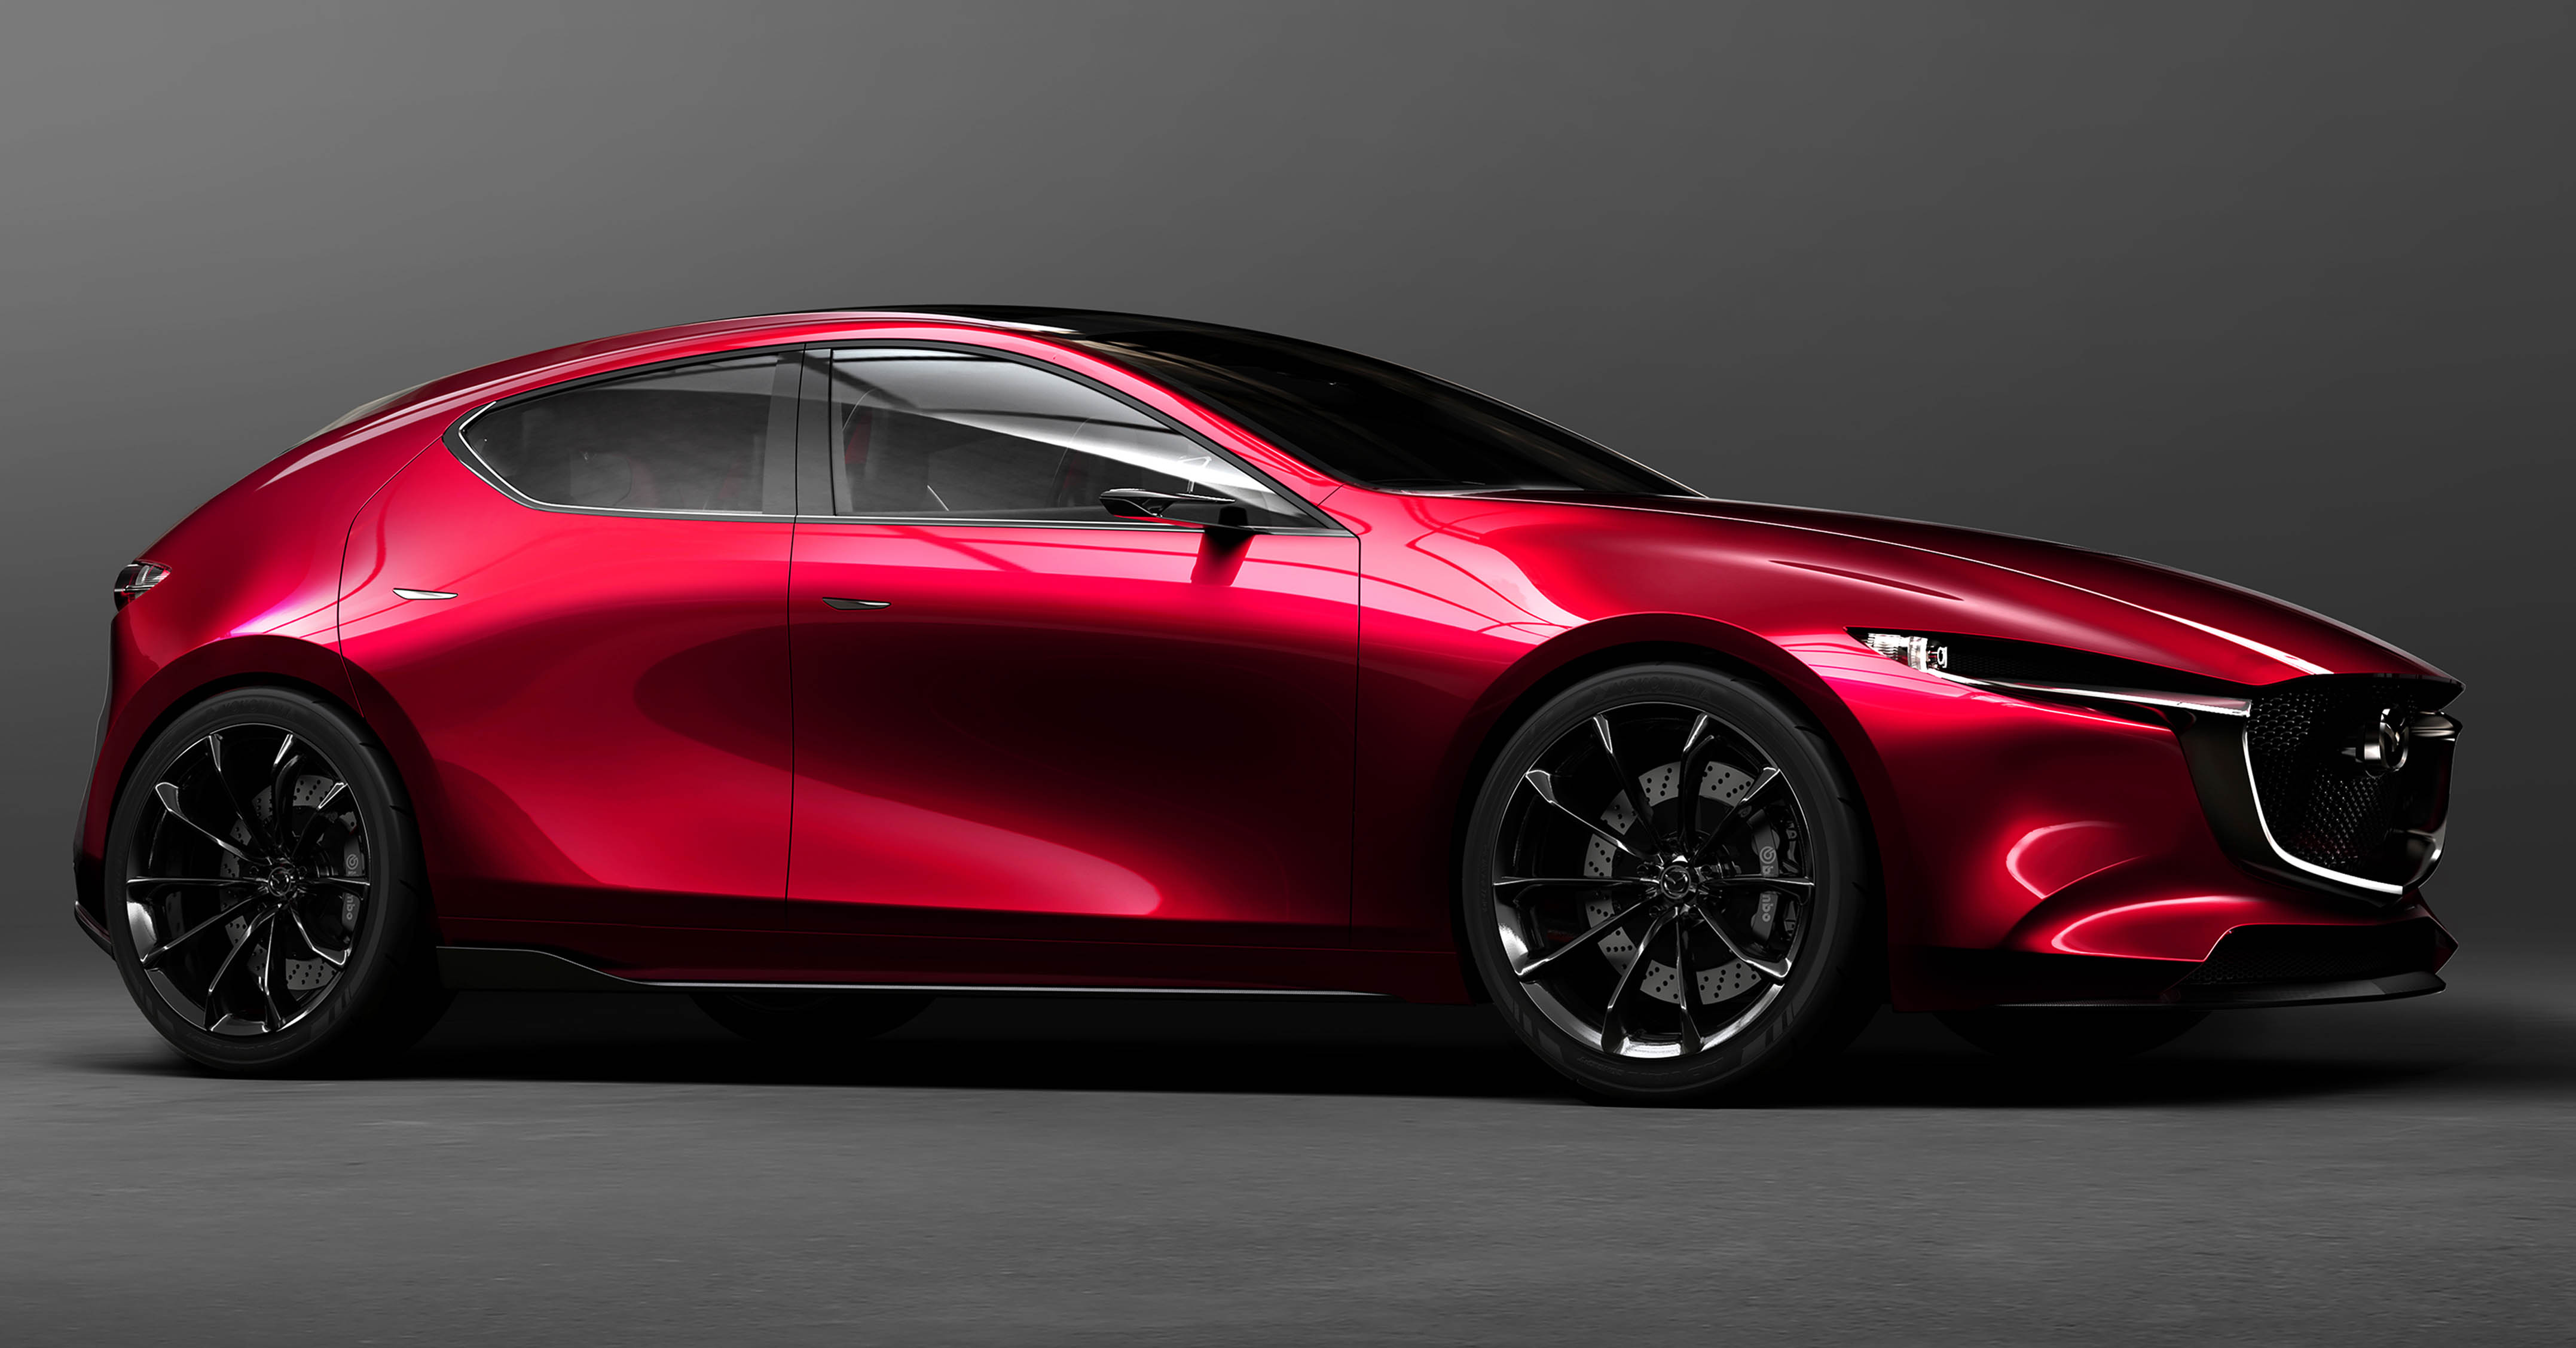 https://s3.paultan.org/cn/image/2017/10/Mazda-Kai-Concept-2.jpg